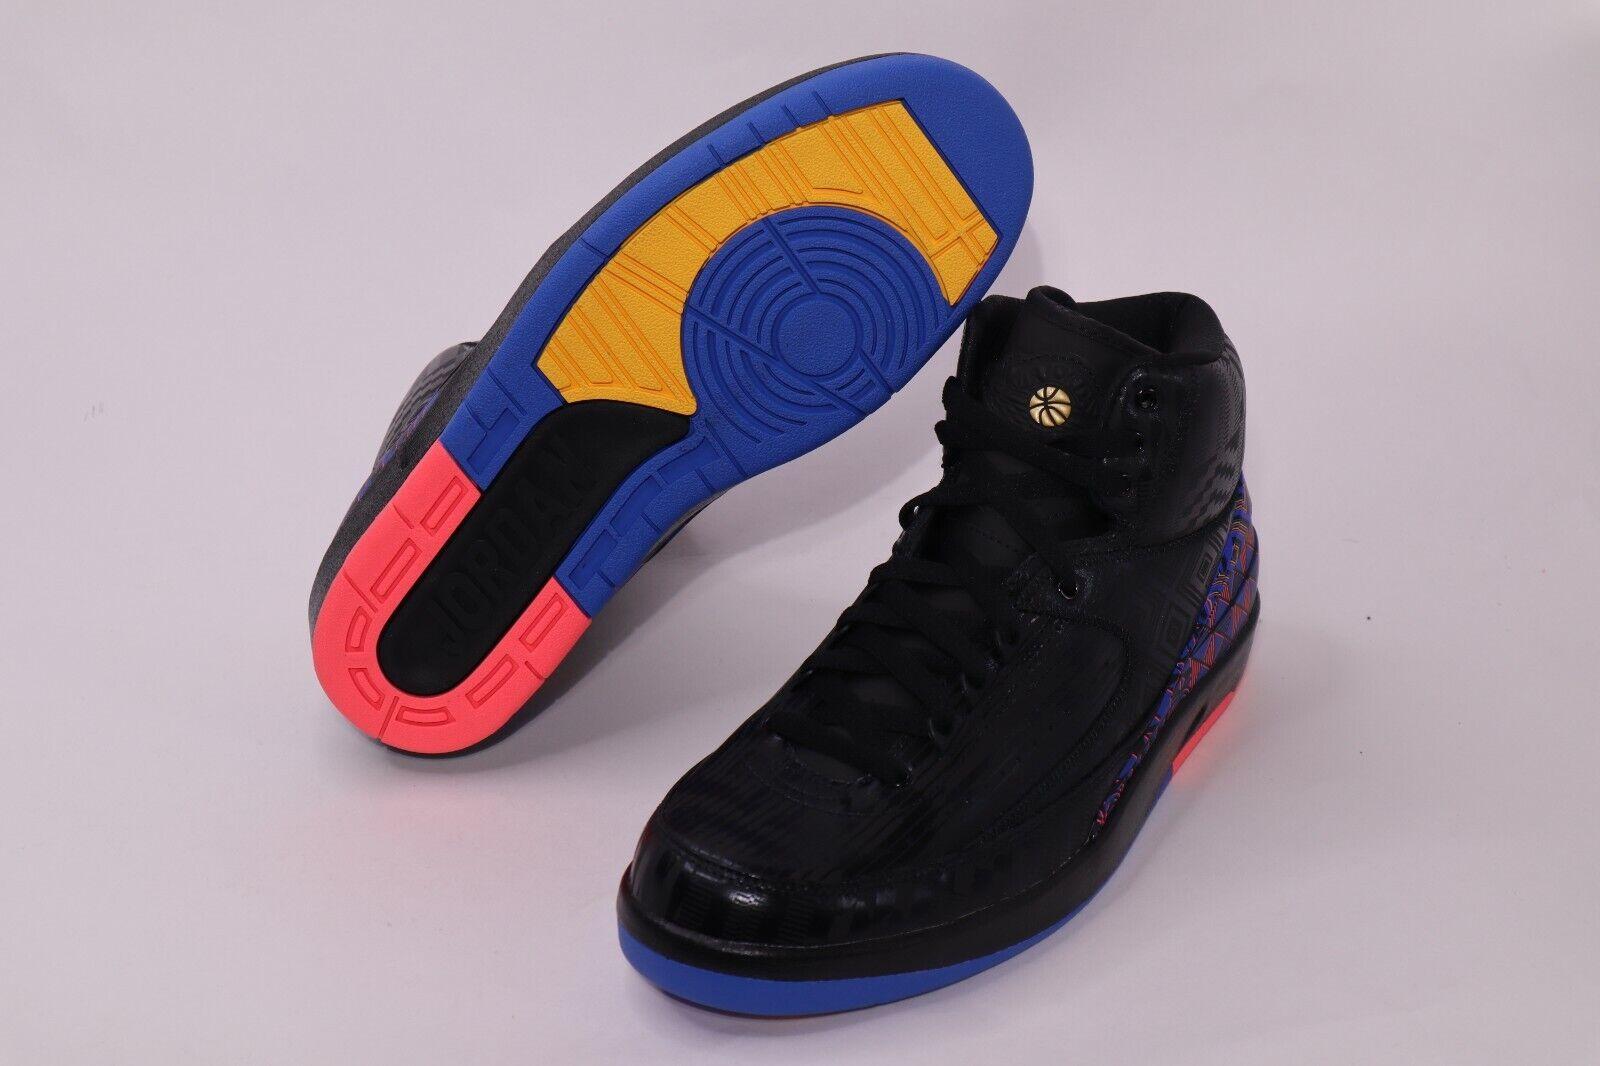 comprar nuevo precios baratass bastante baratas Nike Air Jordan 2 Retro BHM 2019 Black History Basketball Shoes ...